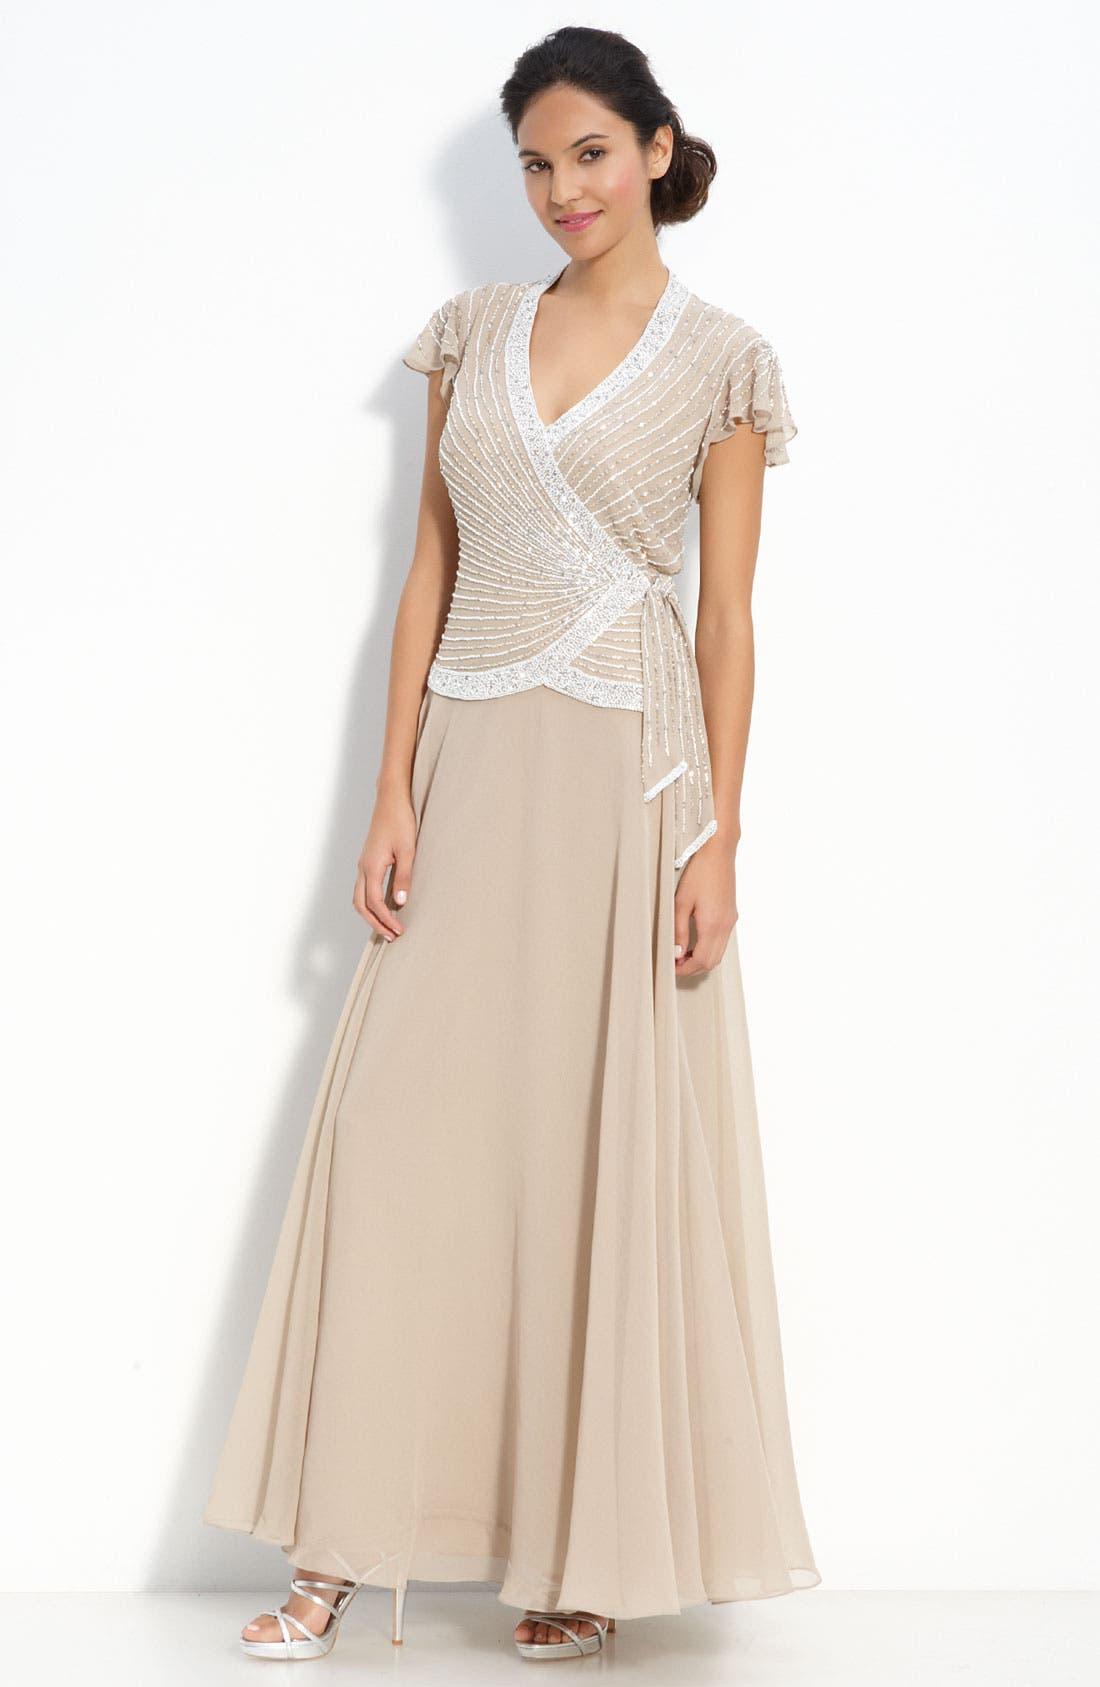 Alternate Image 1 Selected - J Kara Beaded Mock Two-Piece Crepe Gown (Petite)